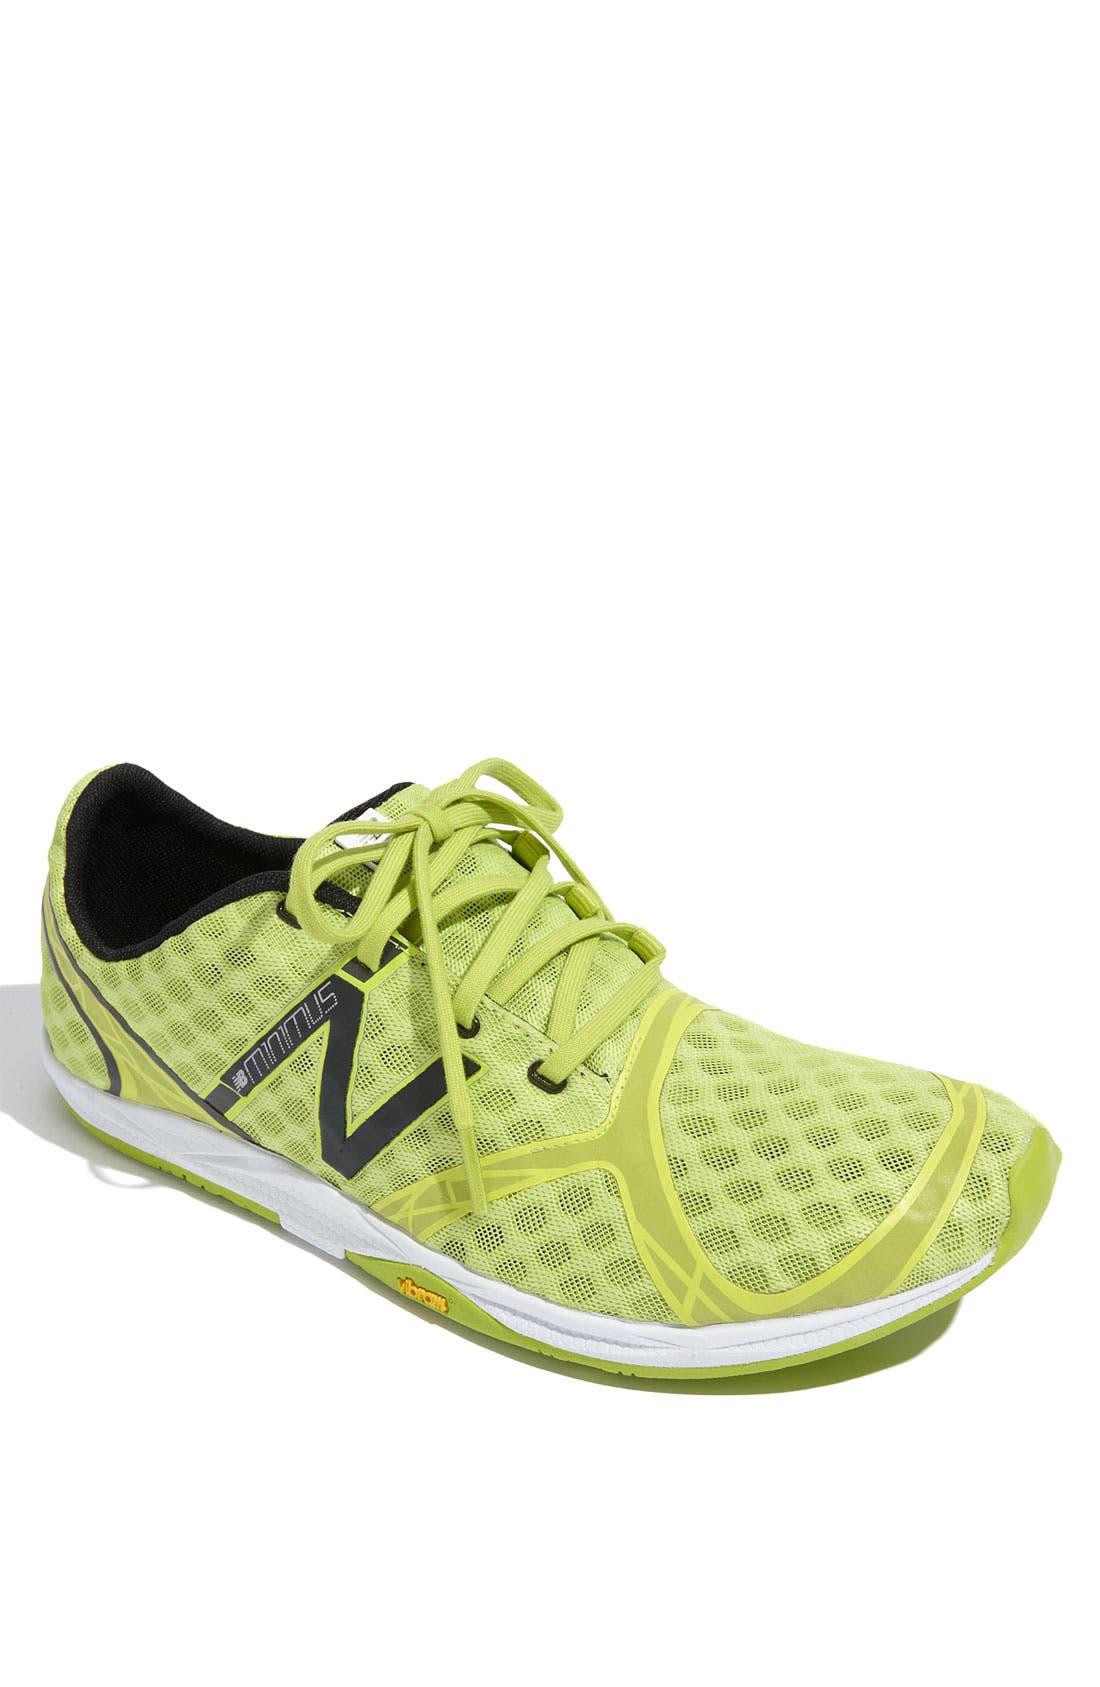 Main Image - New Balance 'Minimus' Running Shoe (Men) (Online Only)